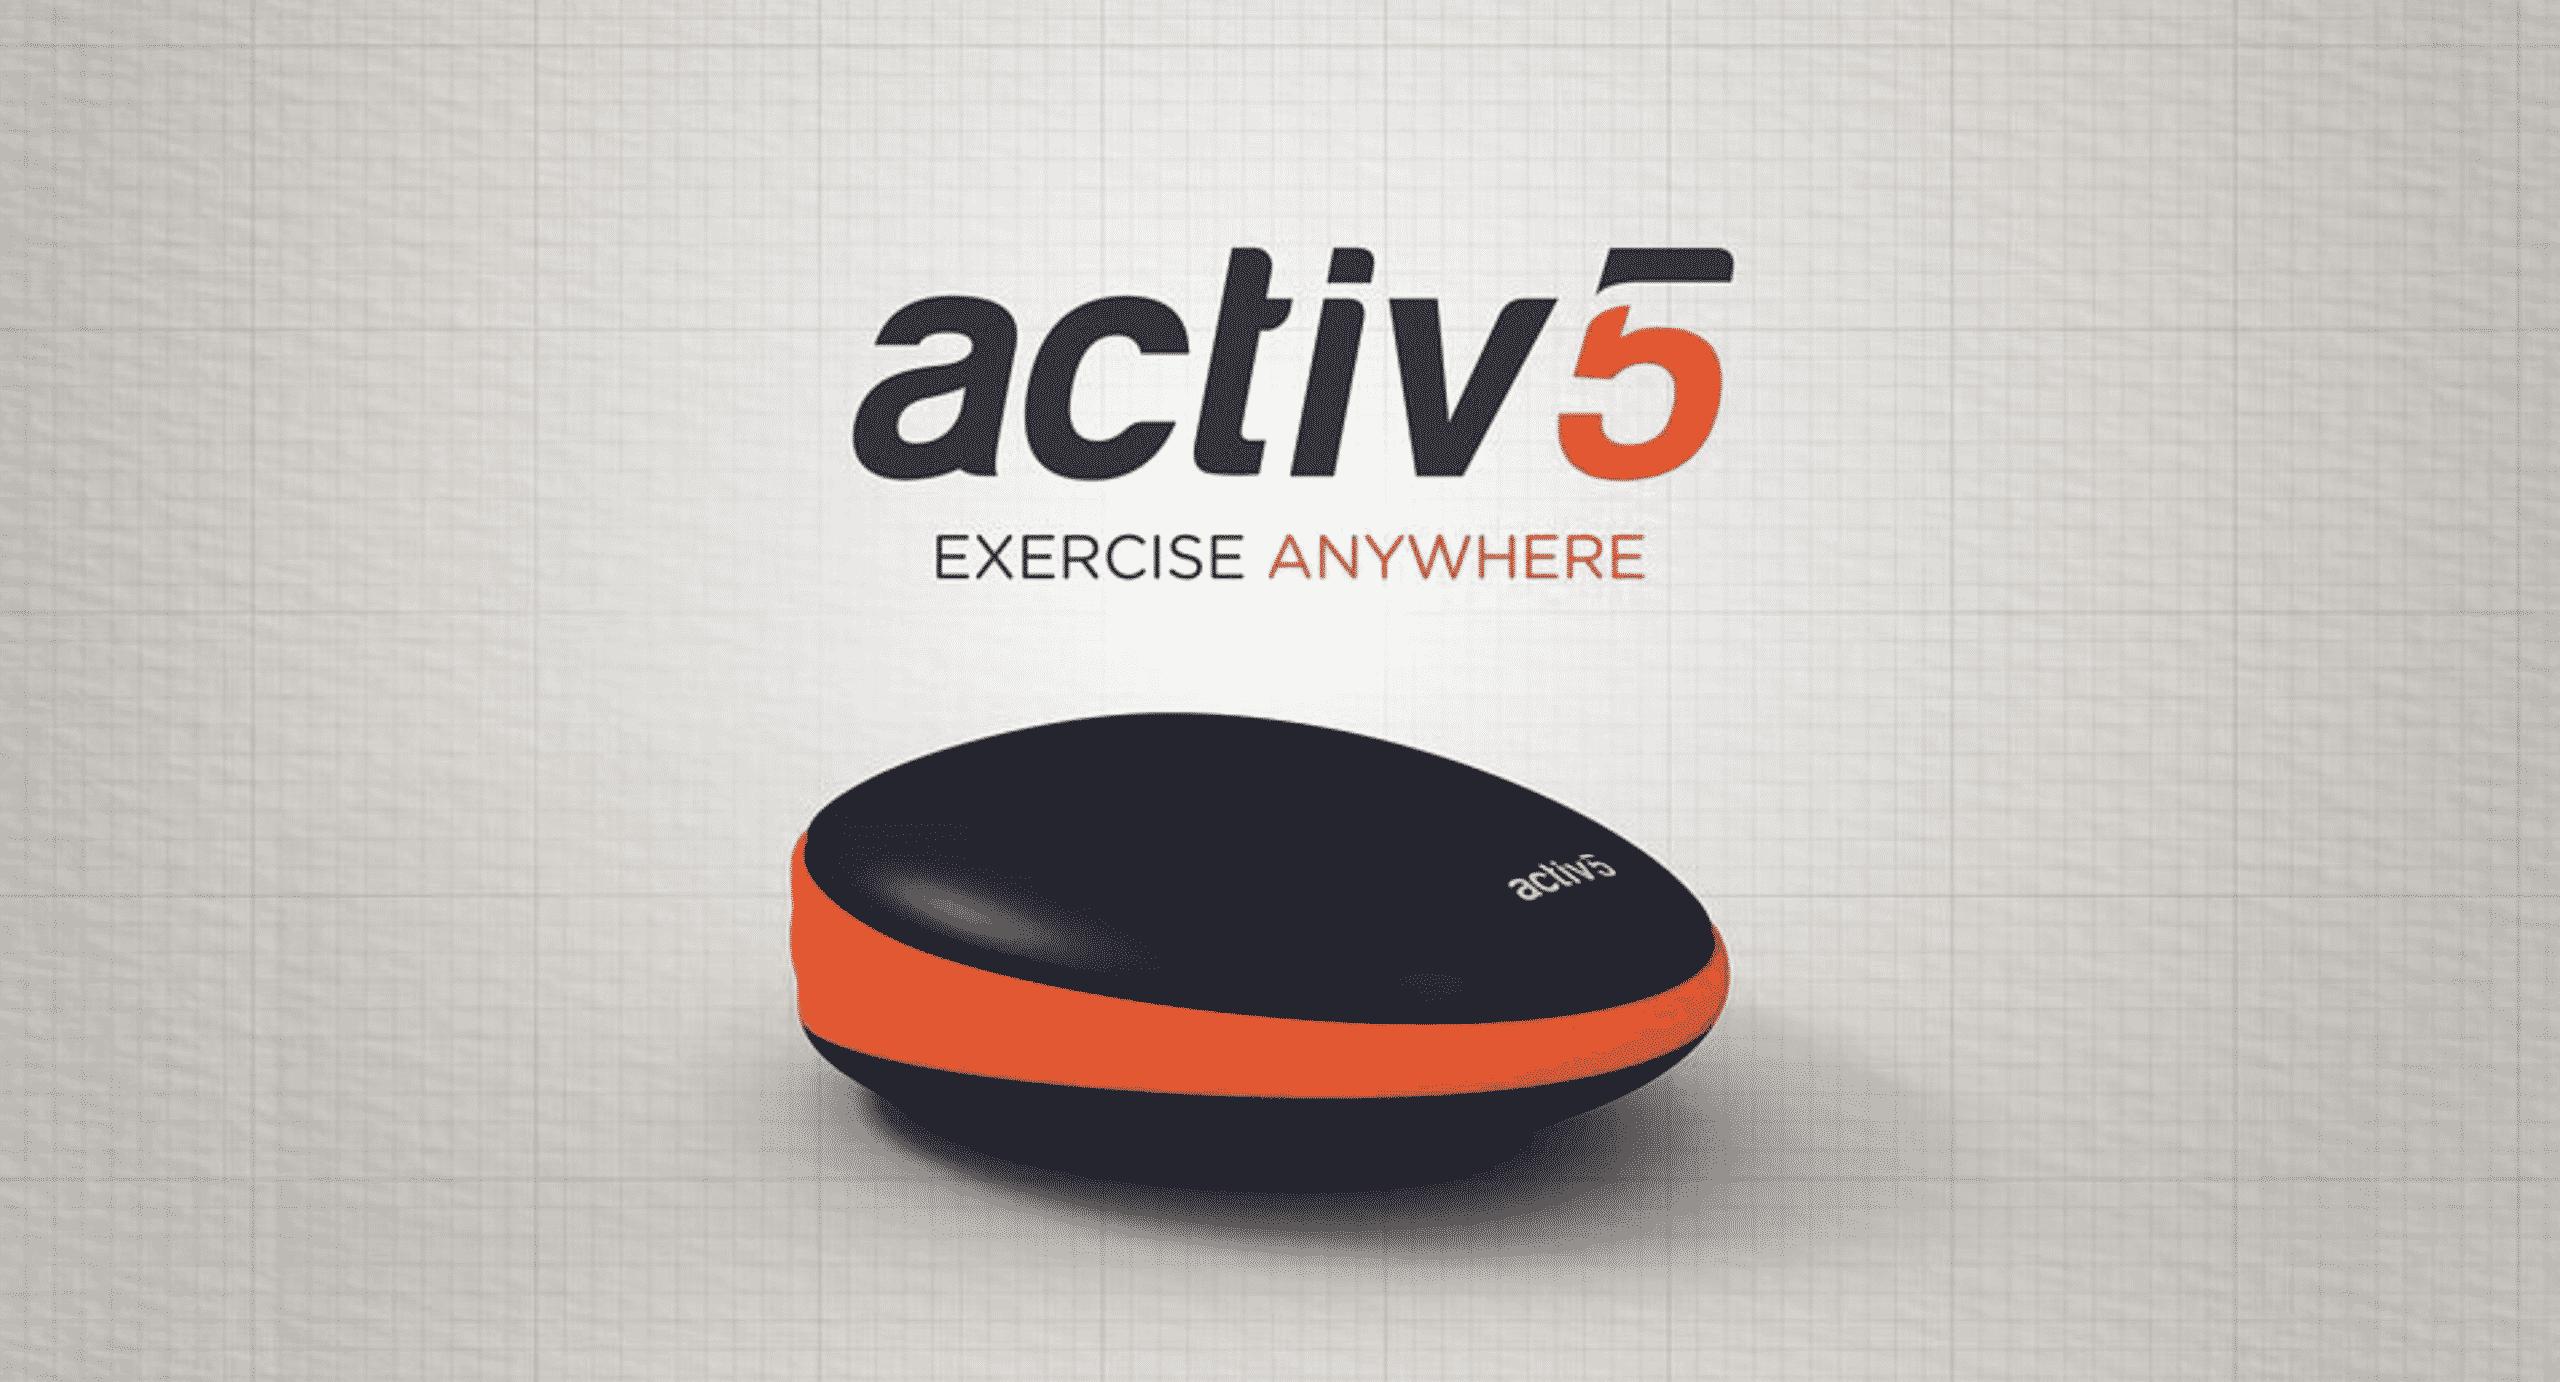 Activbody Activ5